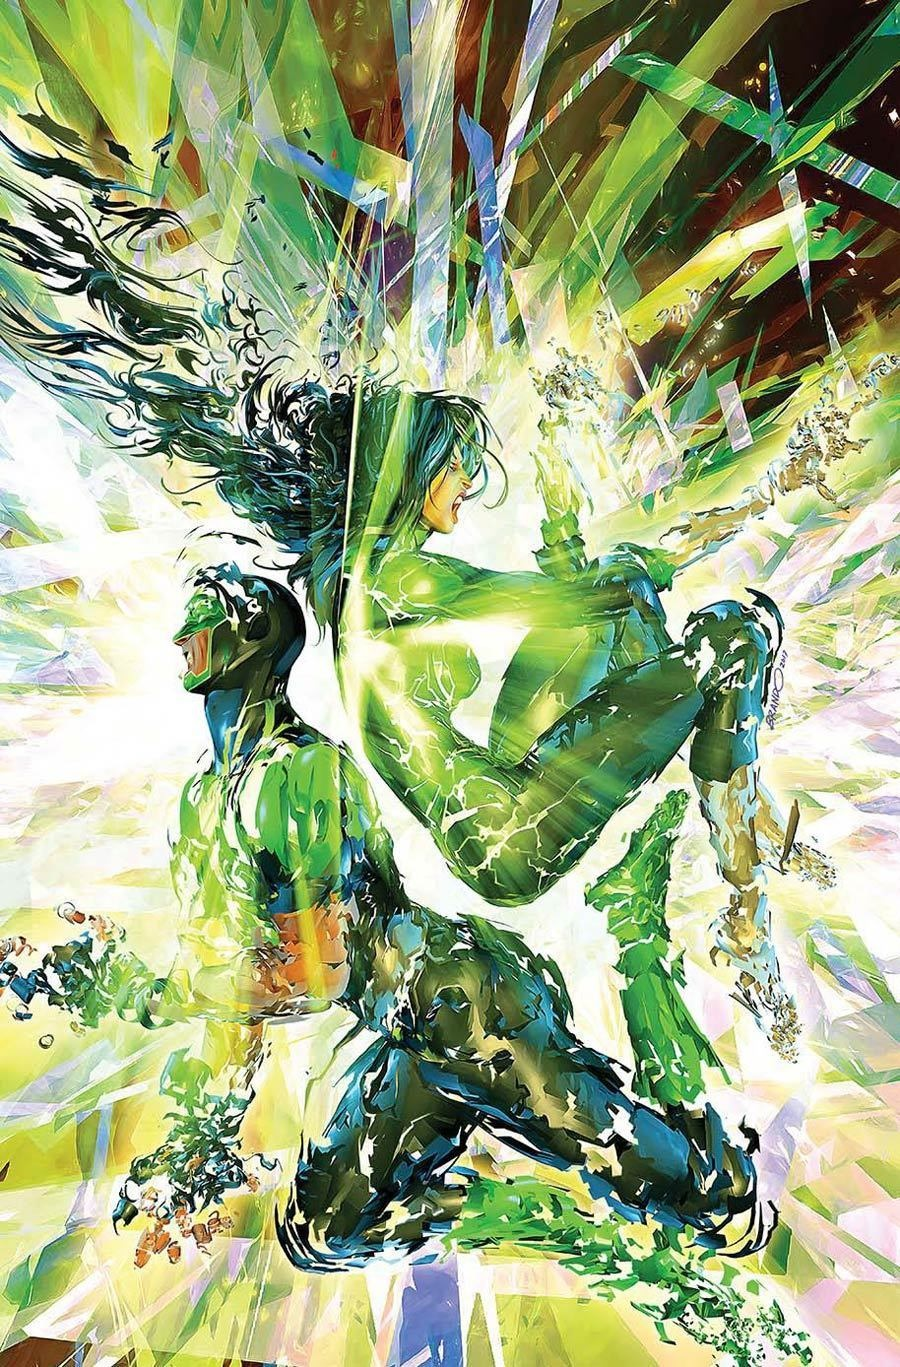 Green Lanterns Vol 1 26 Textless Variant.jpg